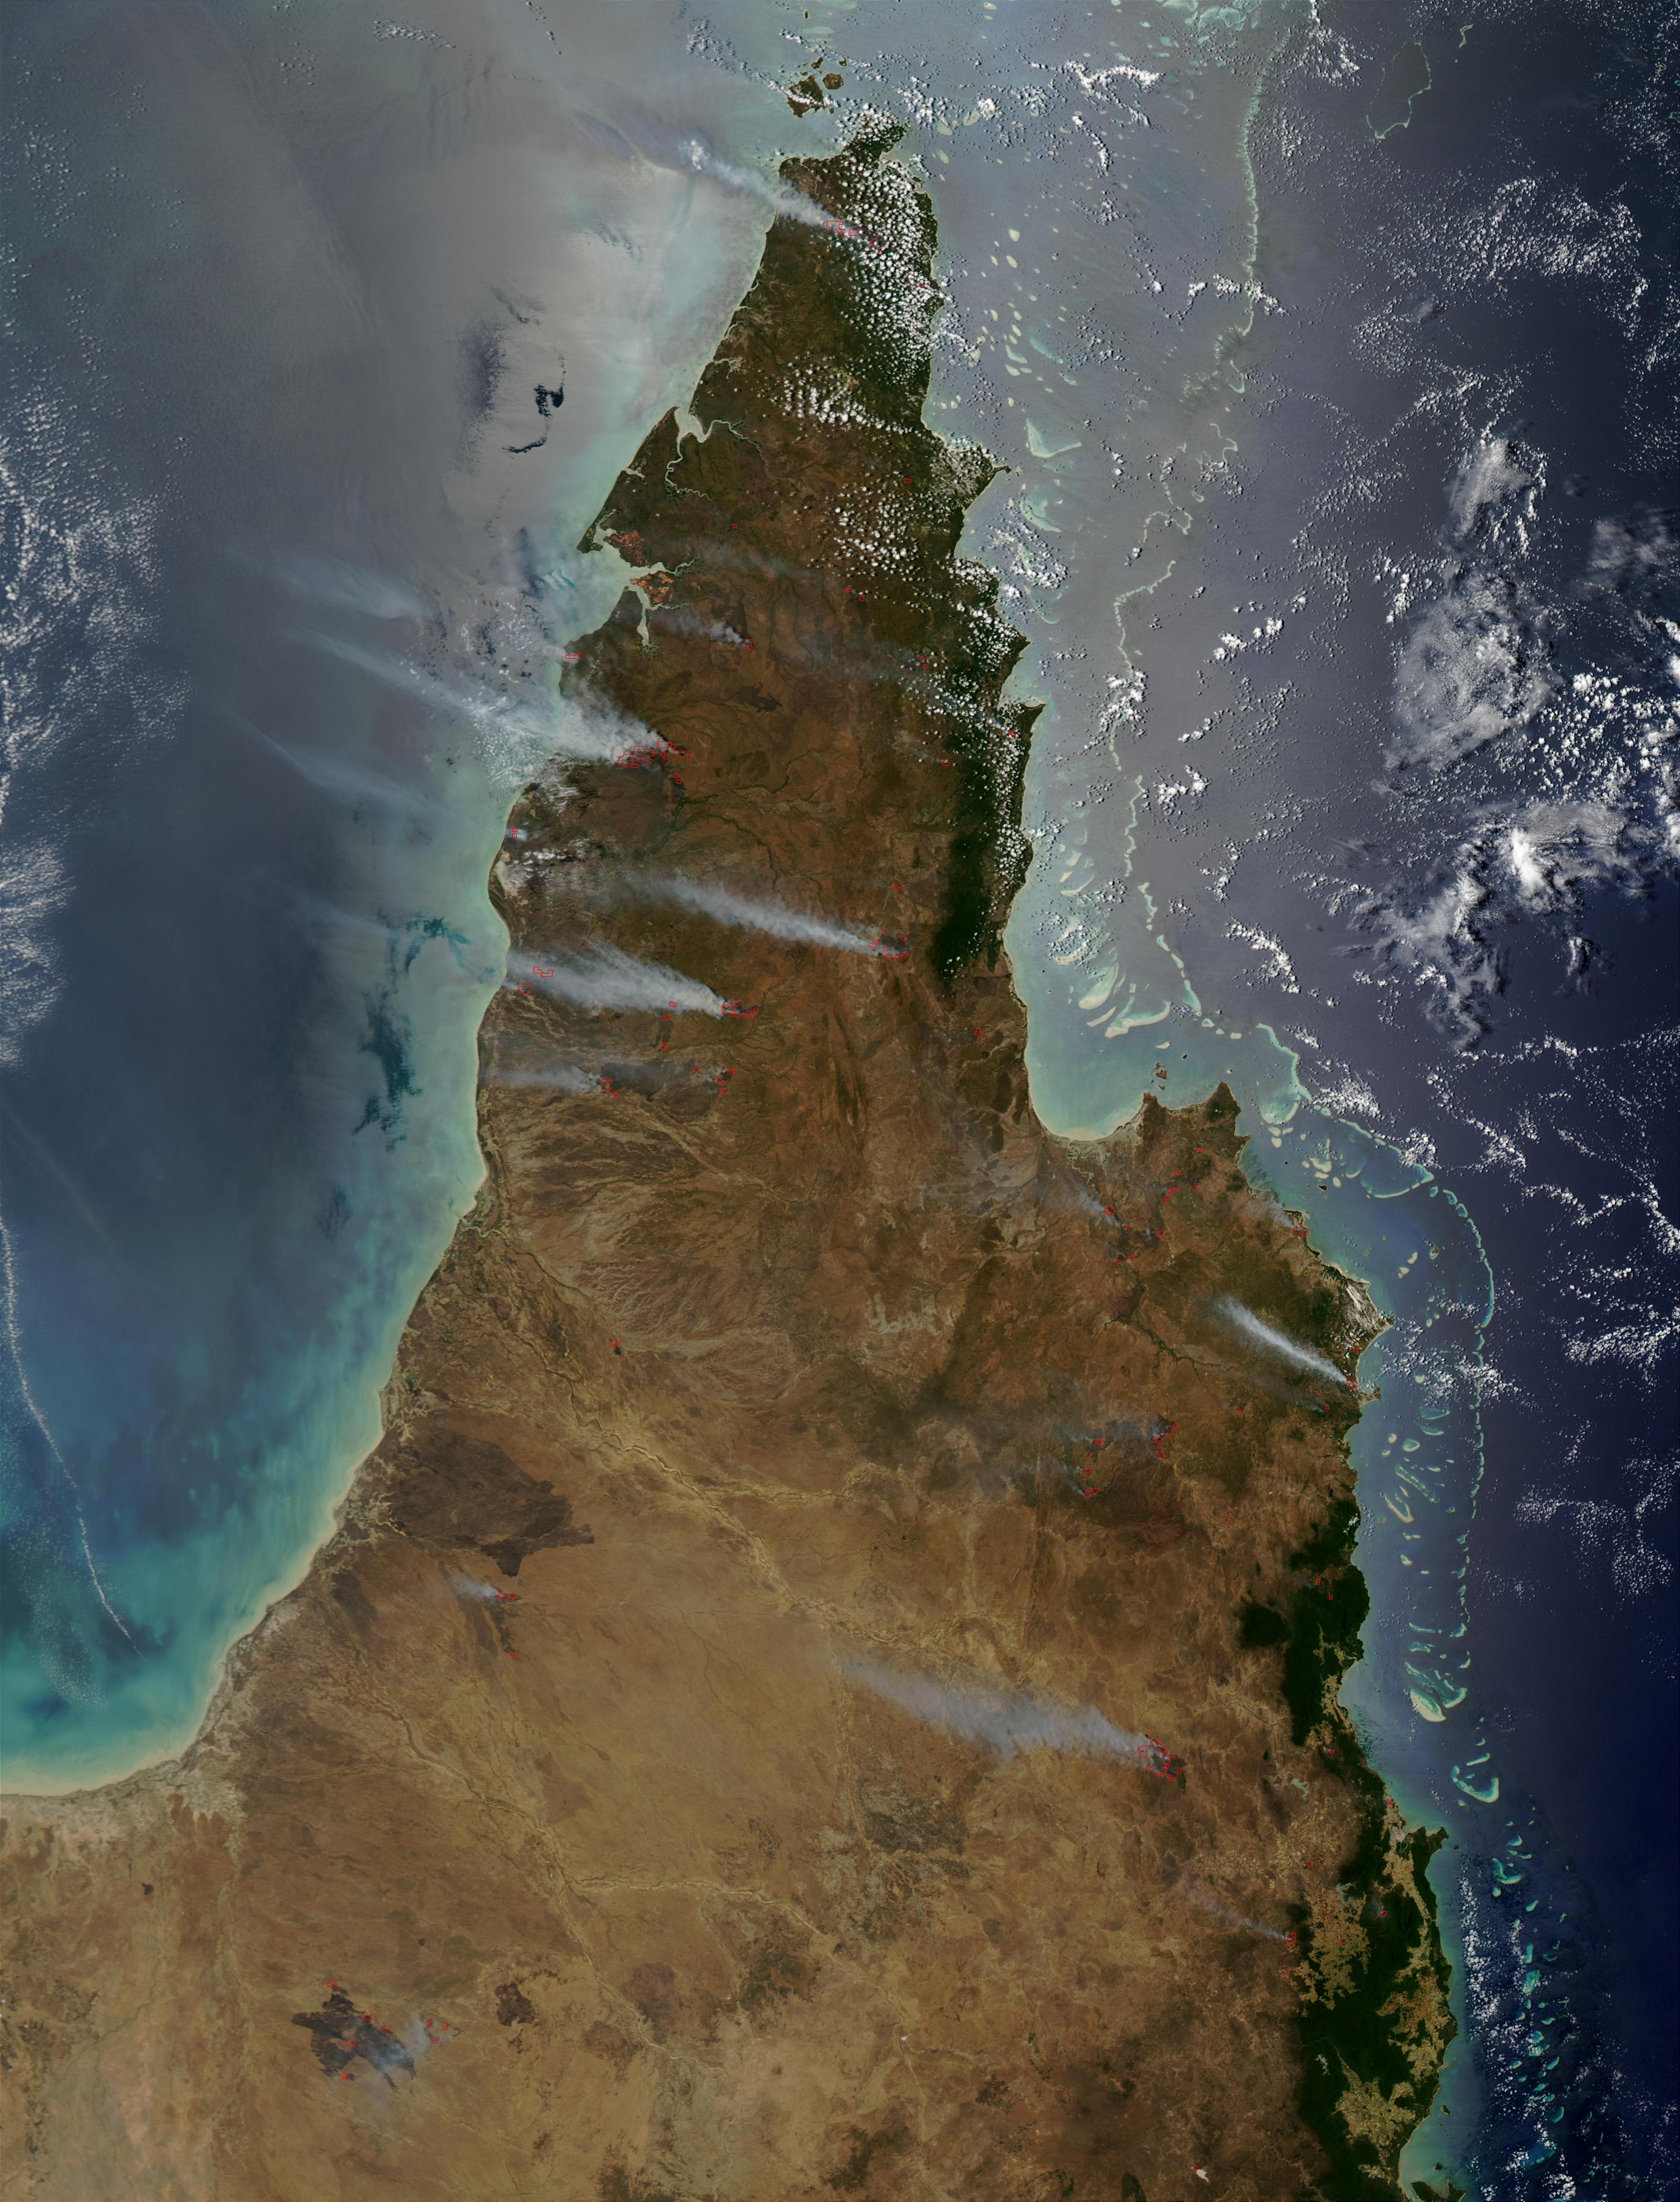 Fires on Cape York Peninsula, Australia